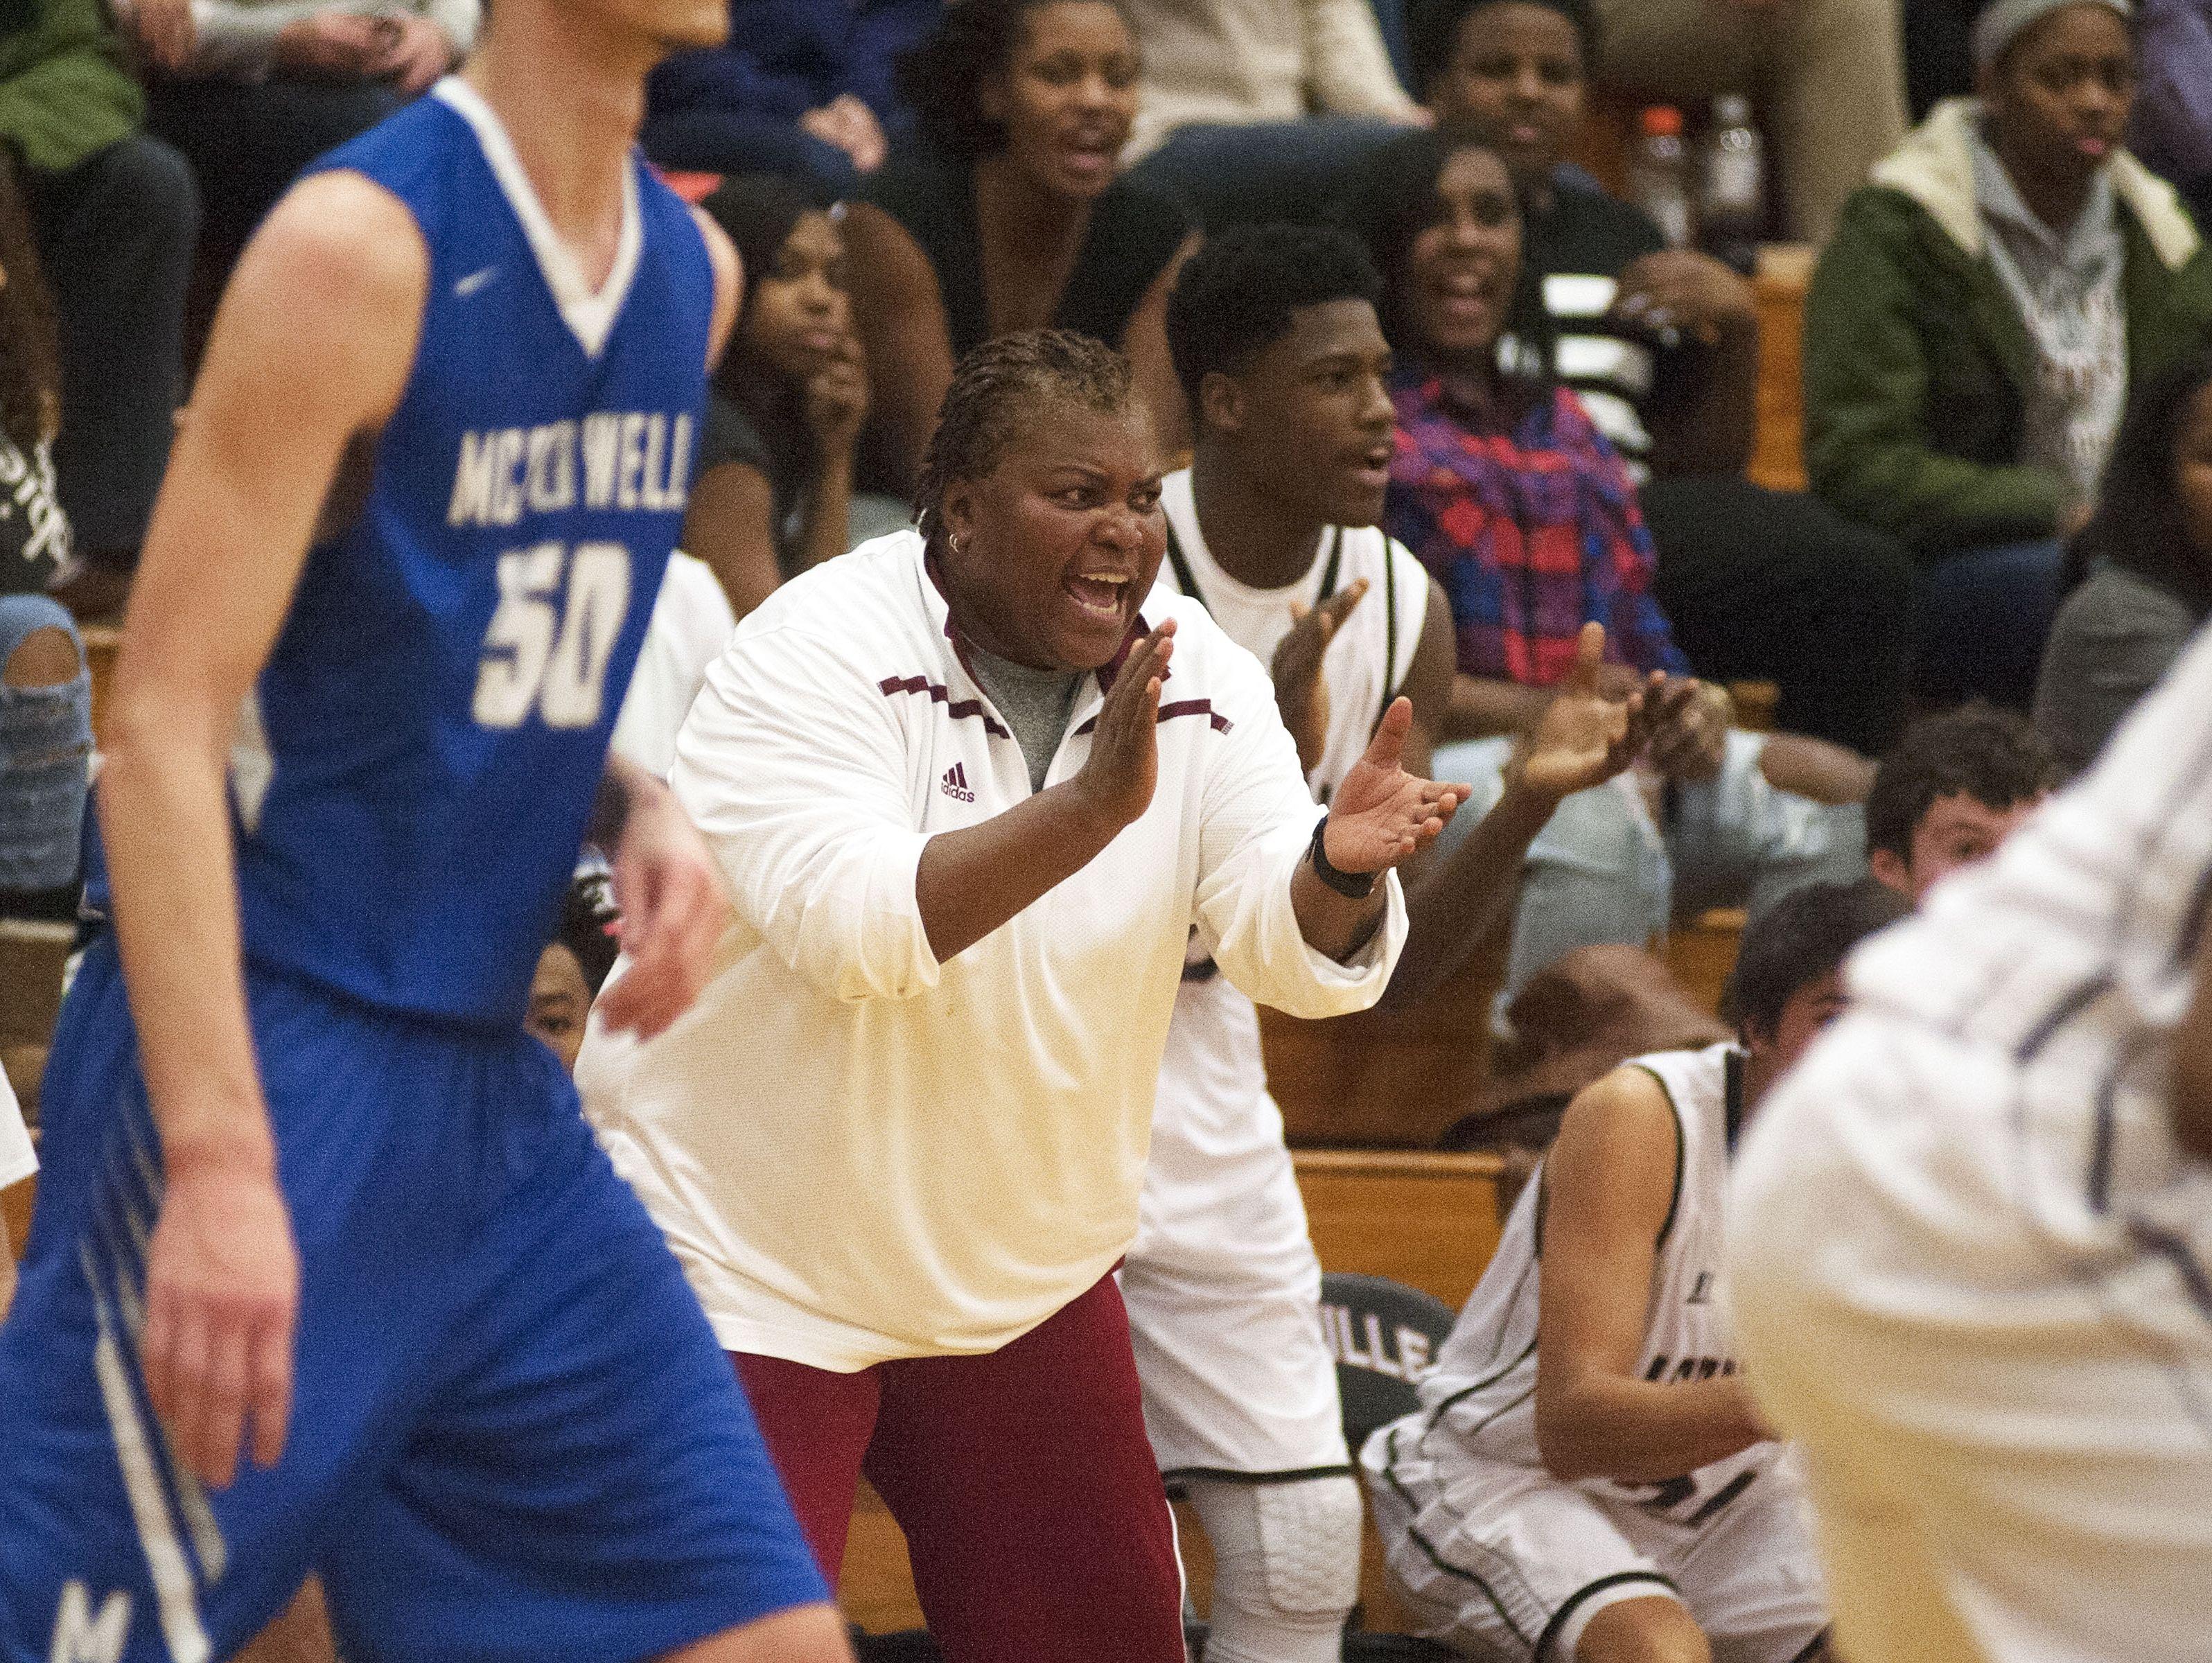 Sonita Warren-Dixon has been named the new boys basketball coach at Cherokee, the school announced Wednesday.